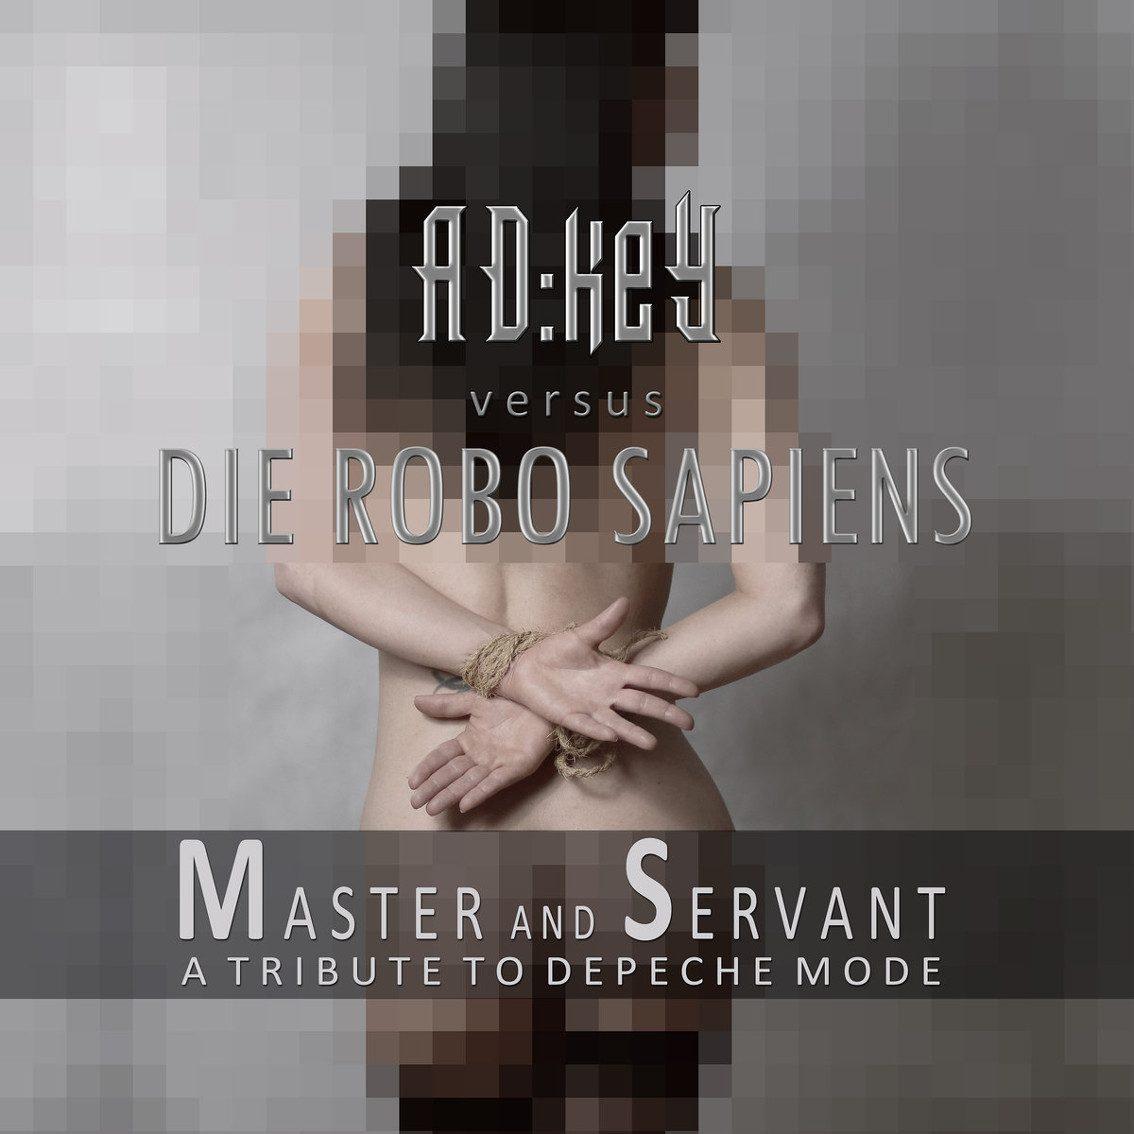 Brand new Depeche Mode tribute EP 'Master and Servant' by AD:keY vs. Die Robo Sapiens has Jurgen Engler on vocals